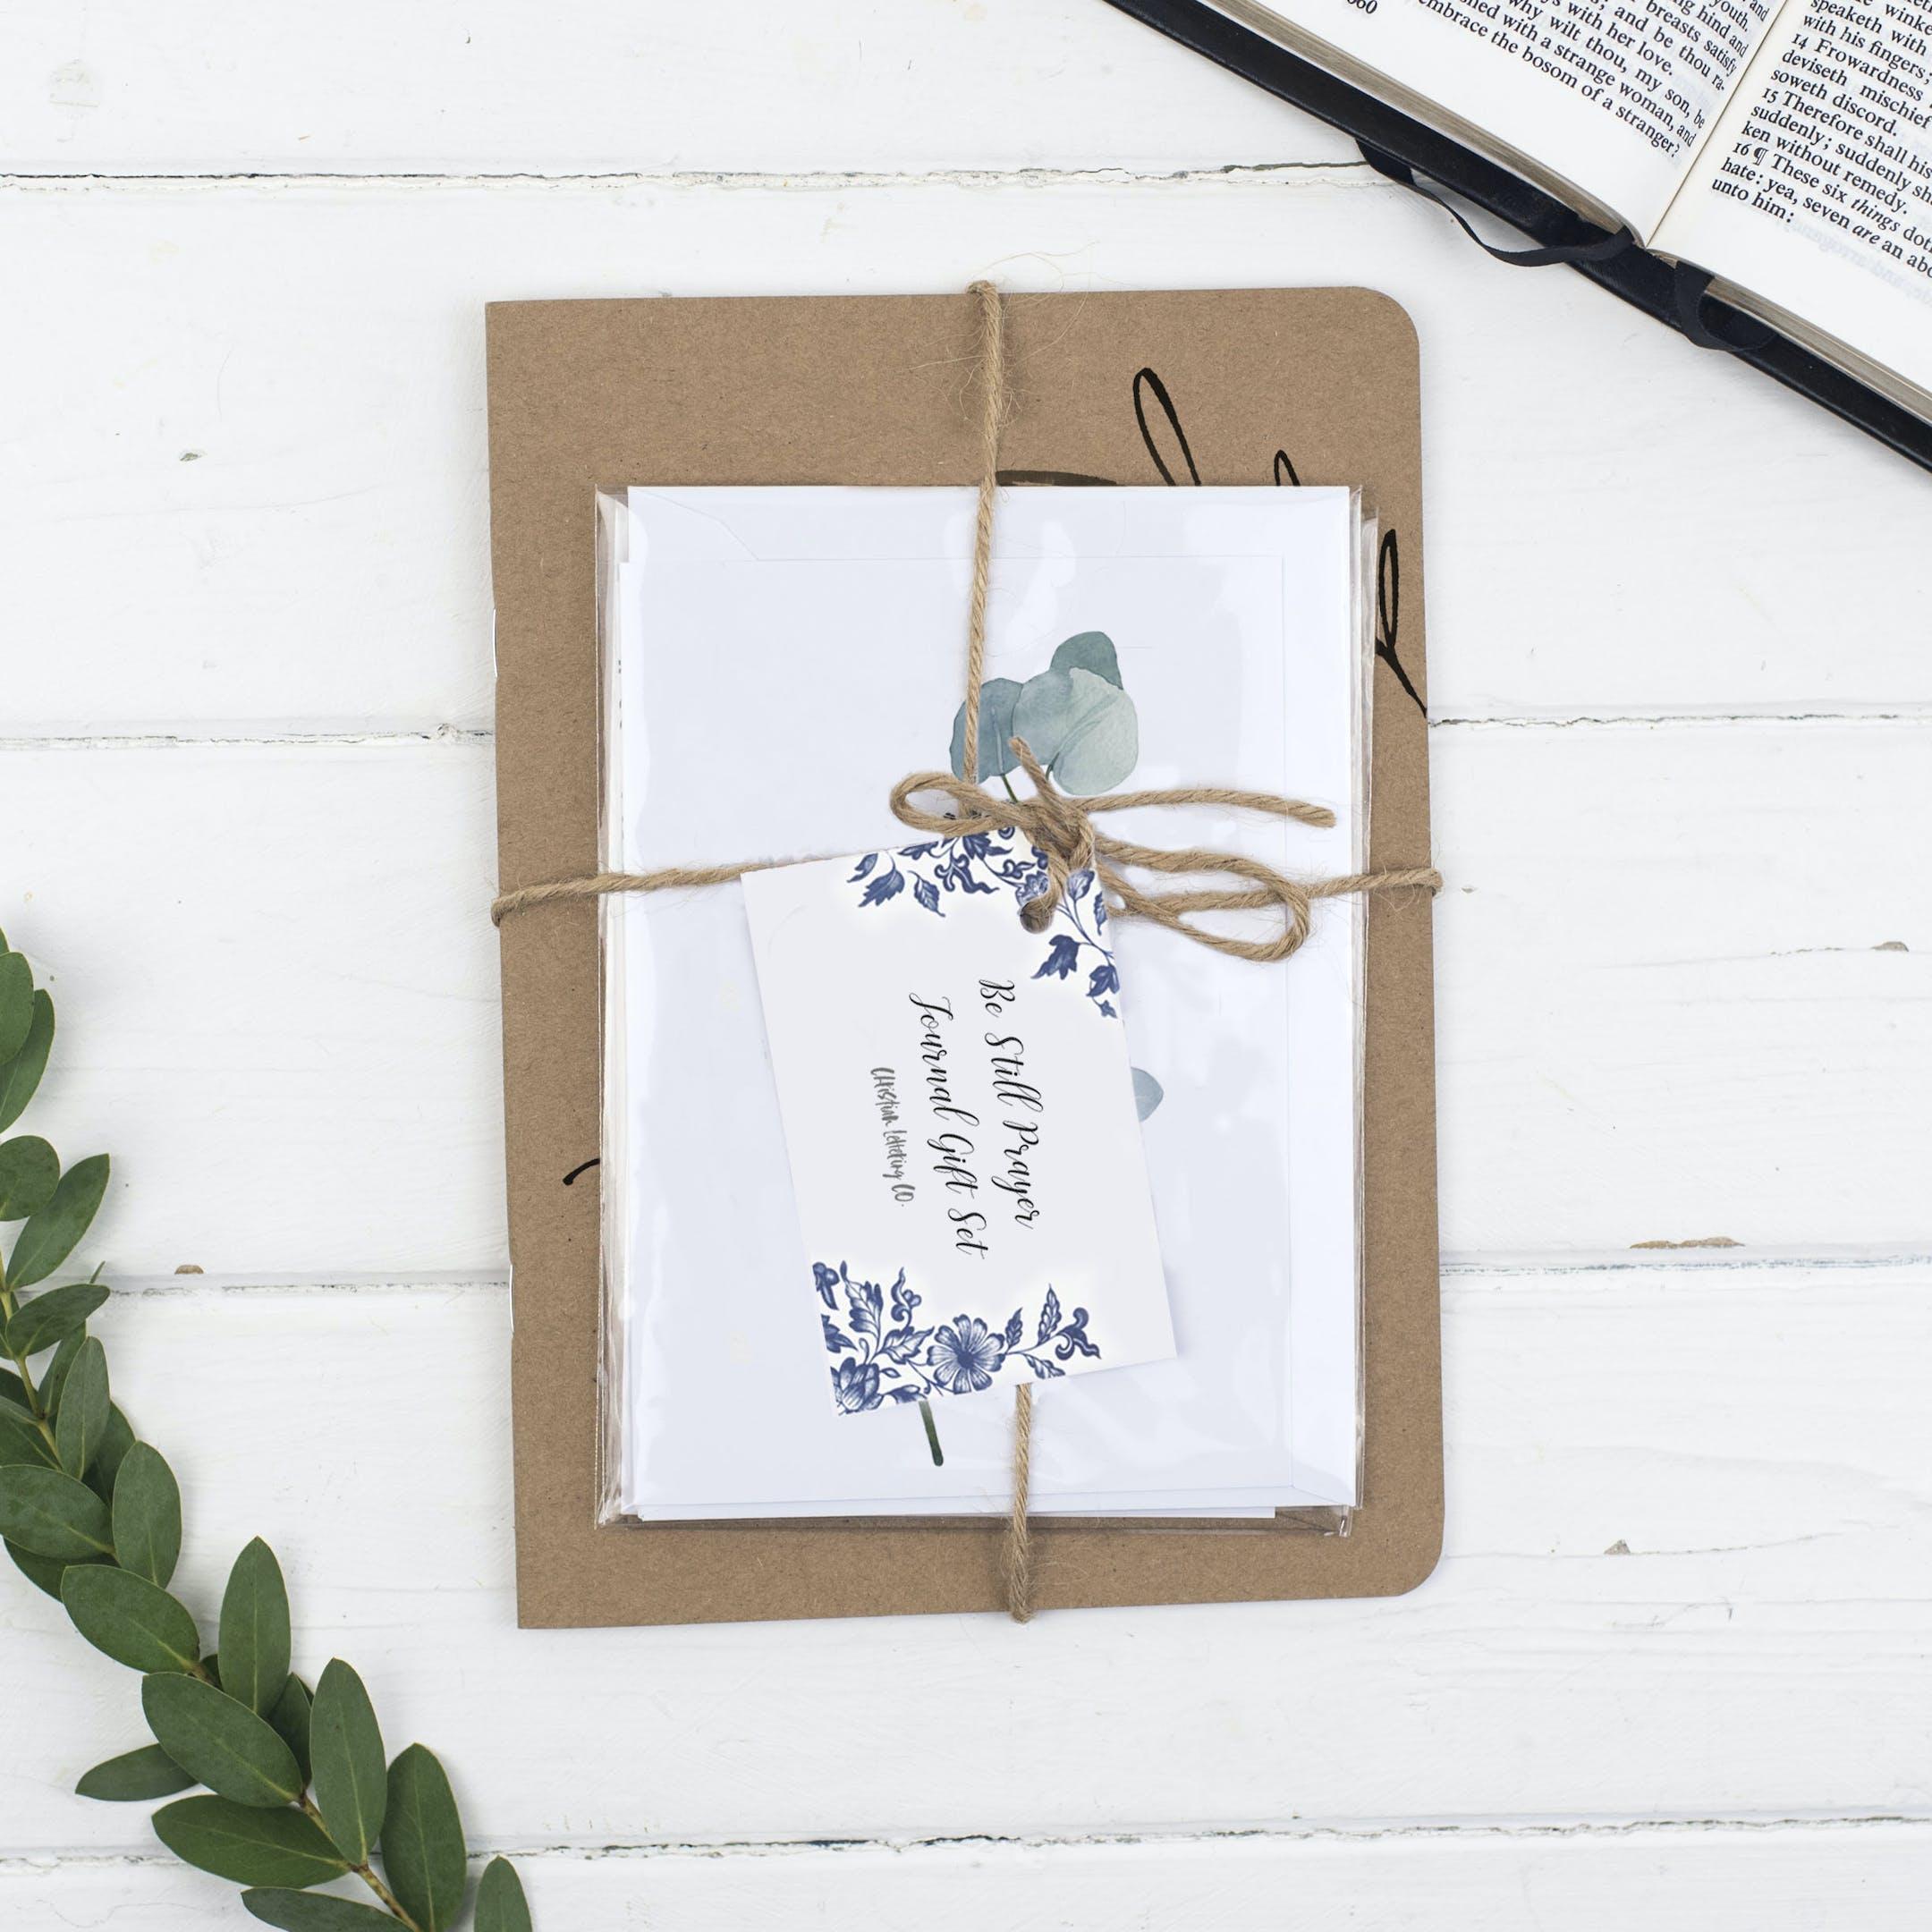 Prayer Journal Gift Set - Be Still - Psalm 46:10 - Christian Lettering Company